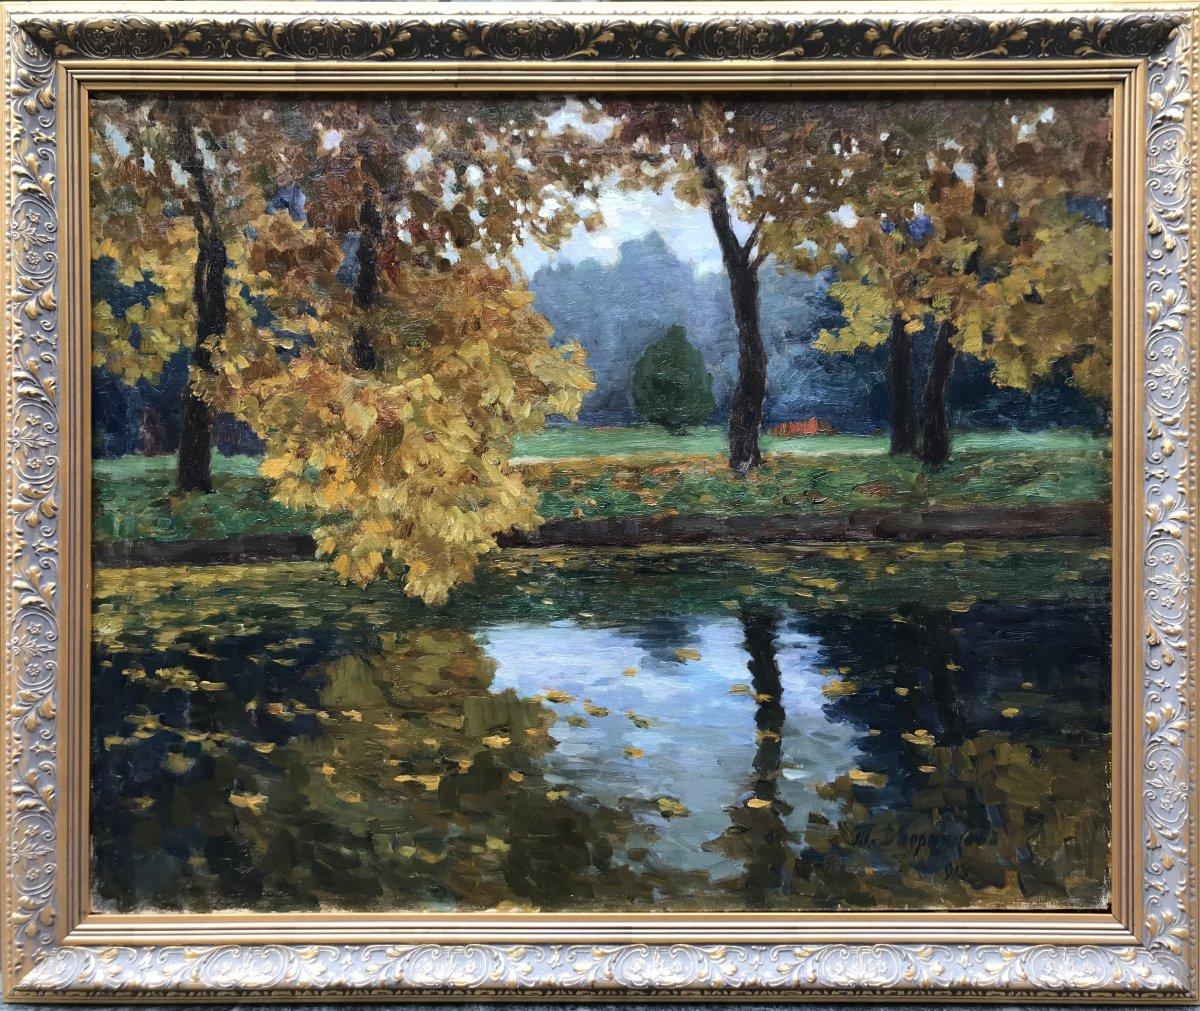 Tit Jokovlevic Dvornikov(1862 Kursk, Russia - 1922 Odessa, Ukraine)  Paysage d'Automne 1913